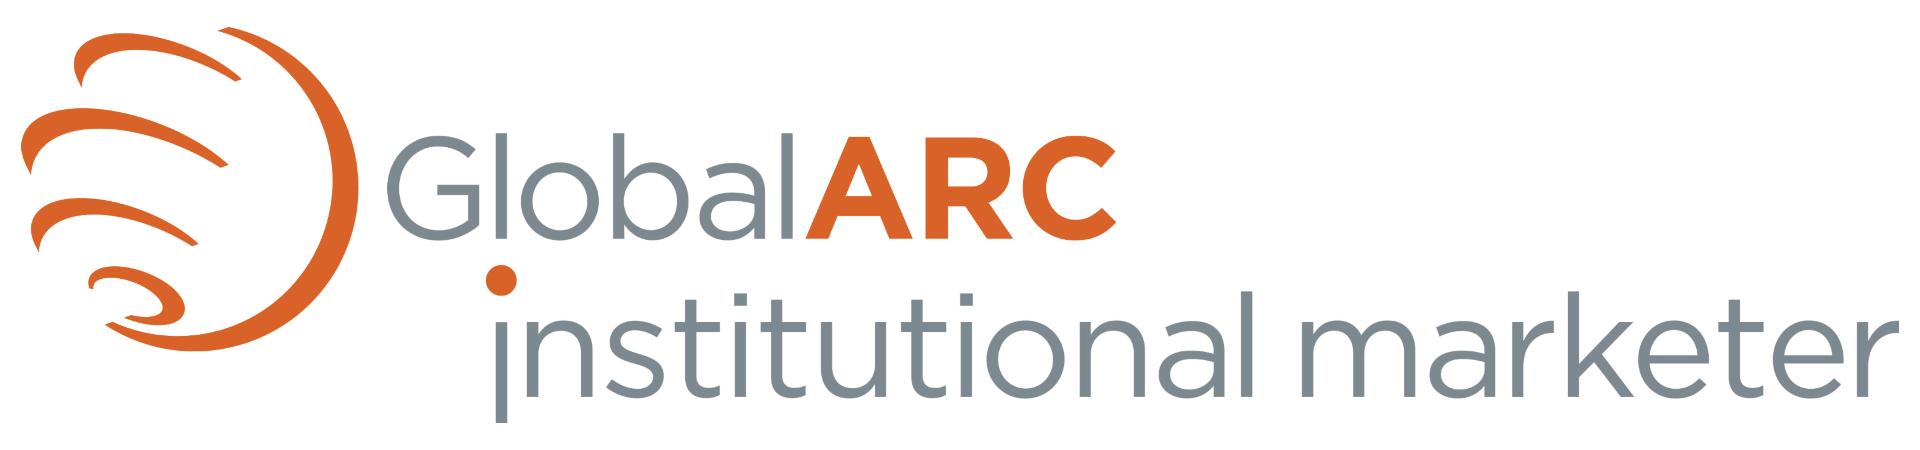 Global ARC Institutional Marketer Logo